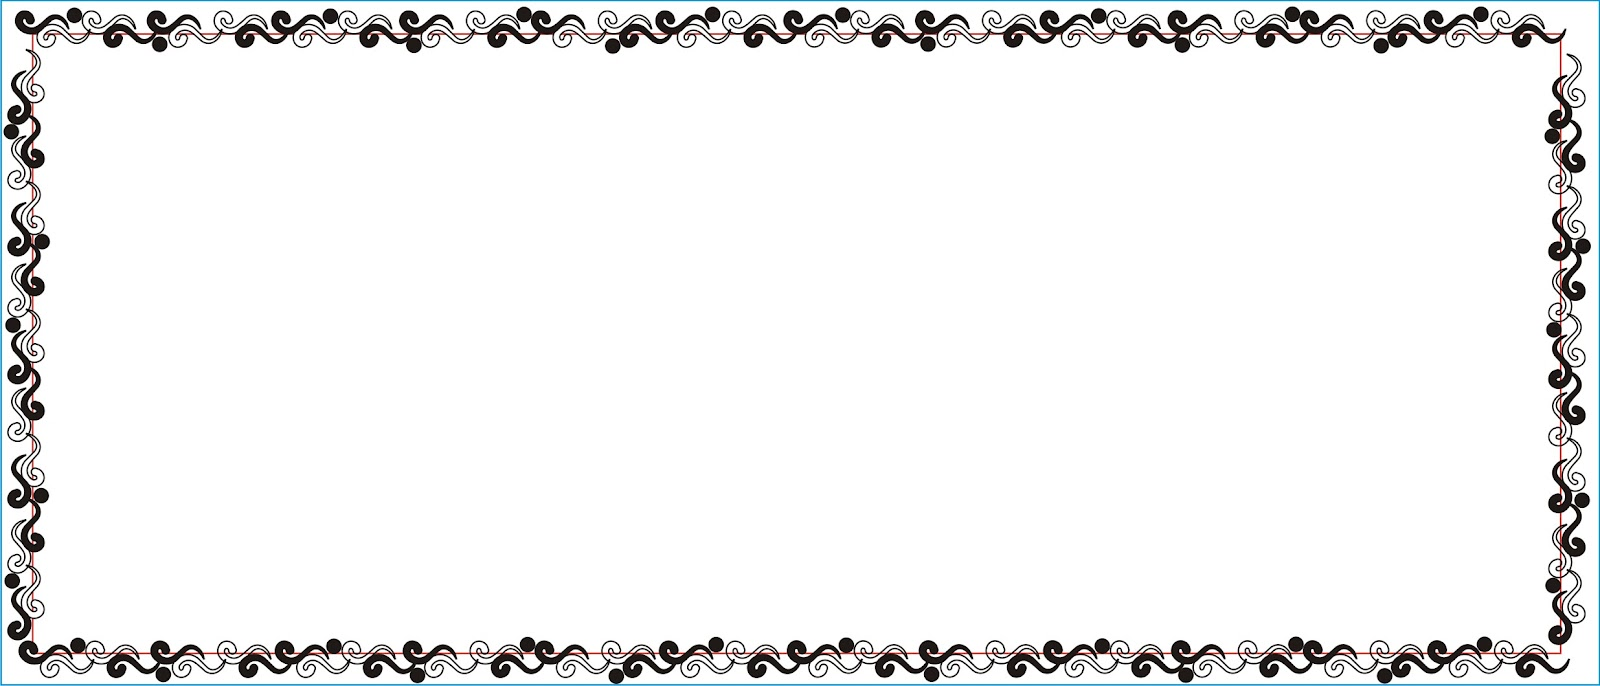 130kb Bingkai Undangan F Clip Art Vector Clip Art Online Caroldoey